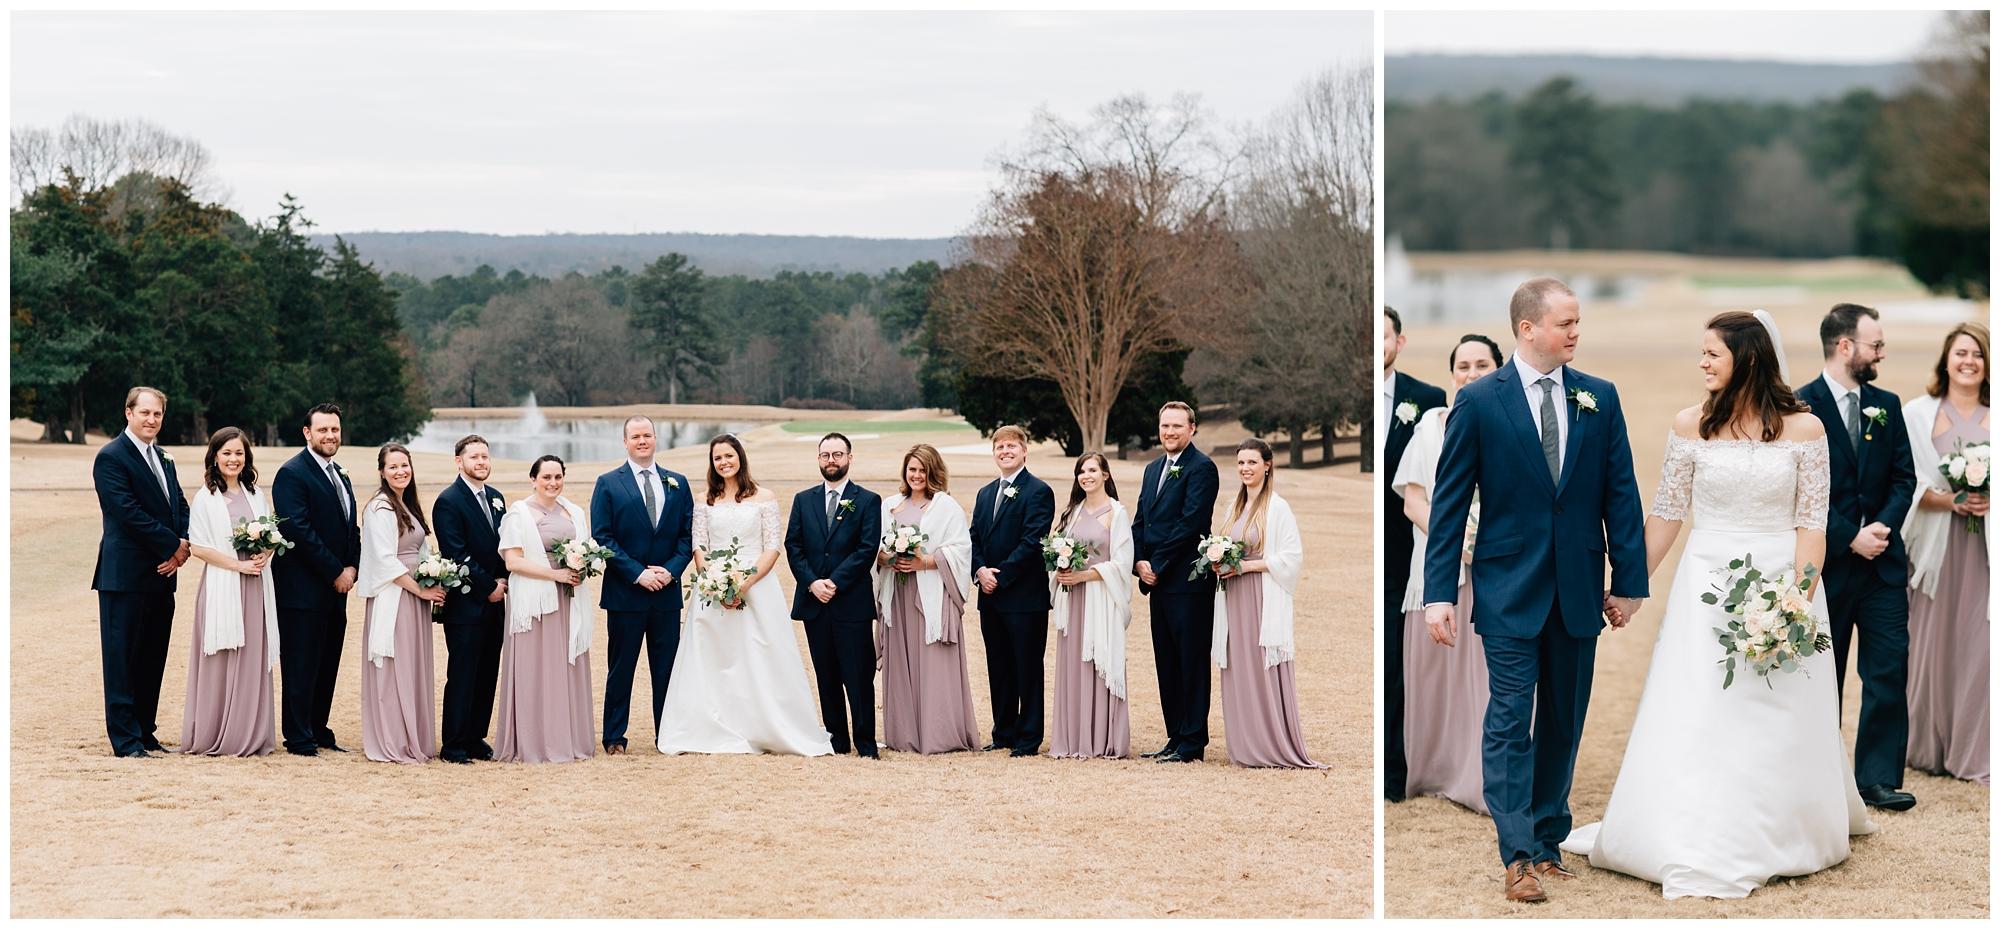 Country-Club-Virginia-Wedding-29.jpg